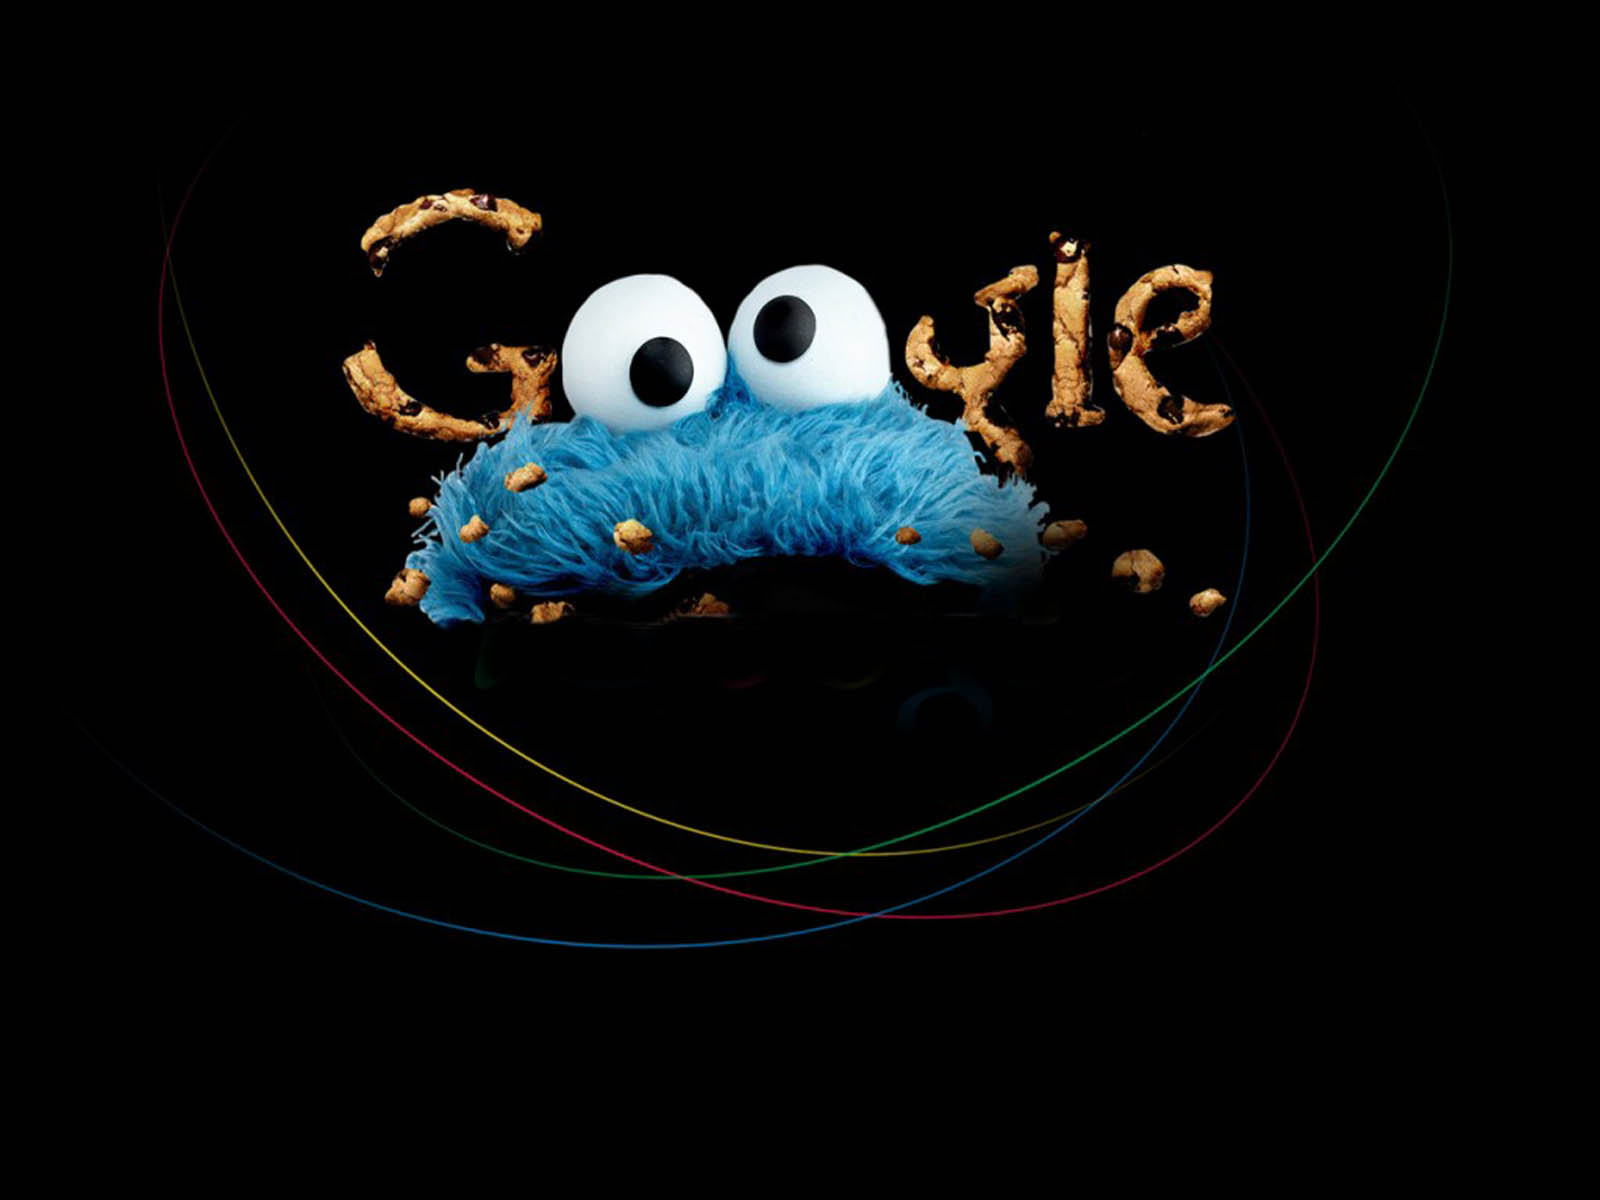 wallpapers: Free Google Wallpapers for Desktop